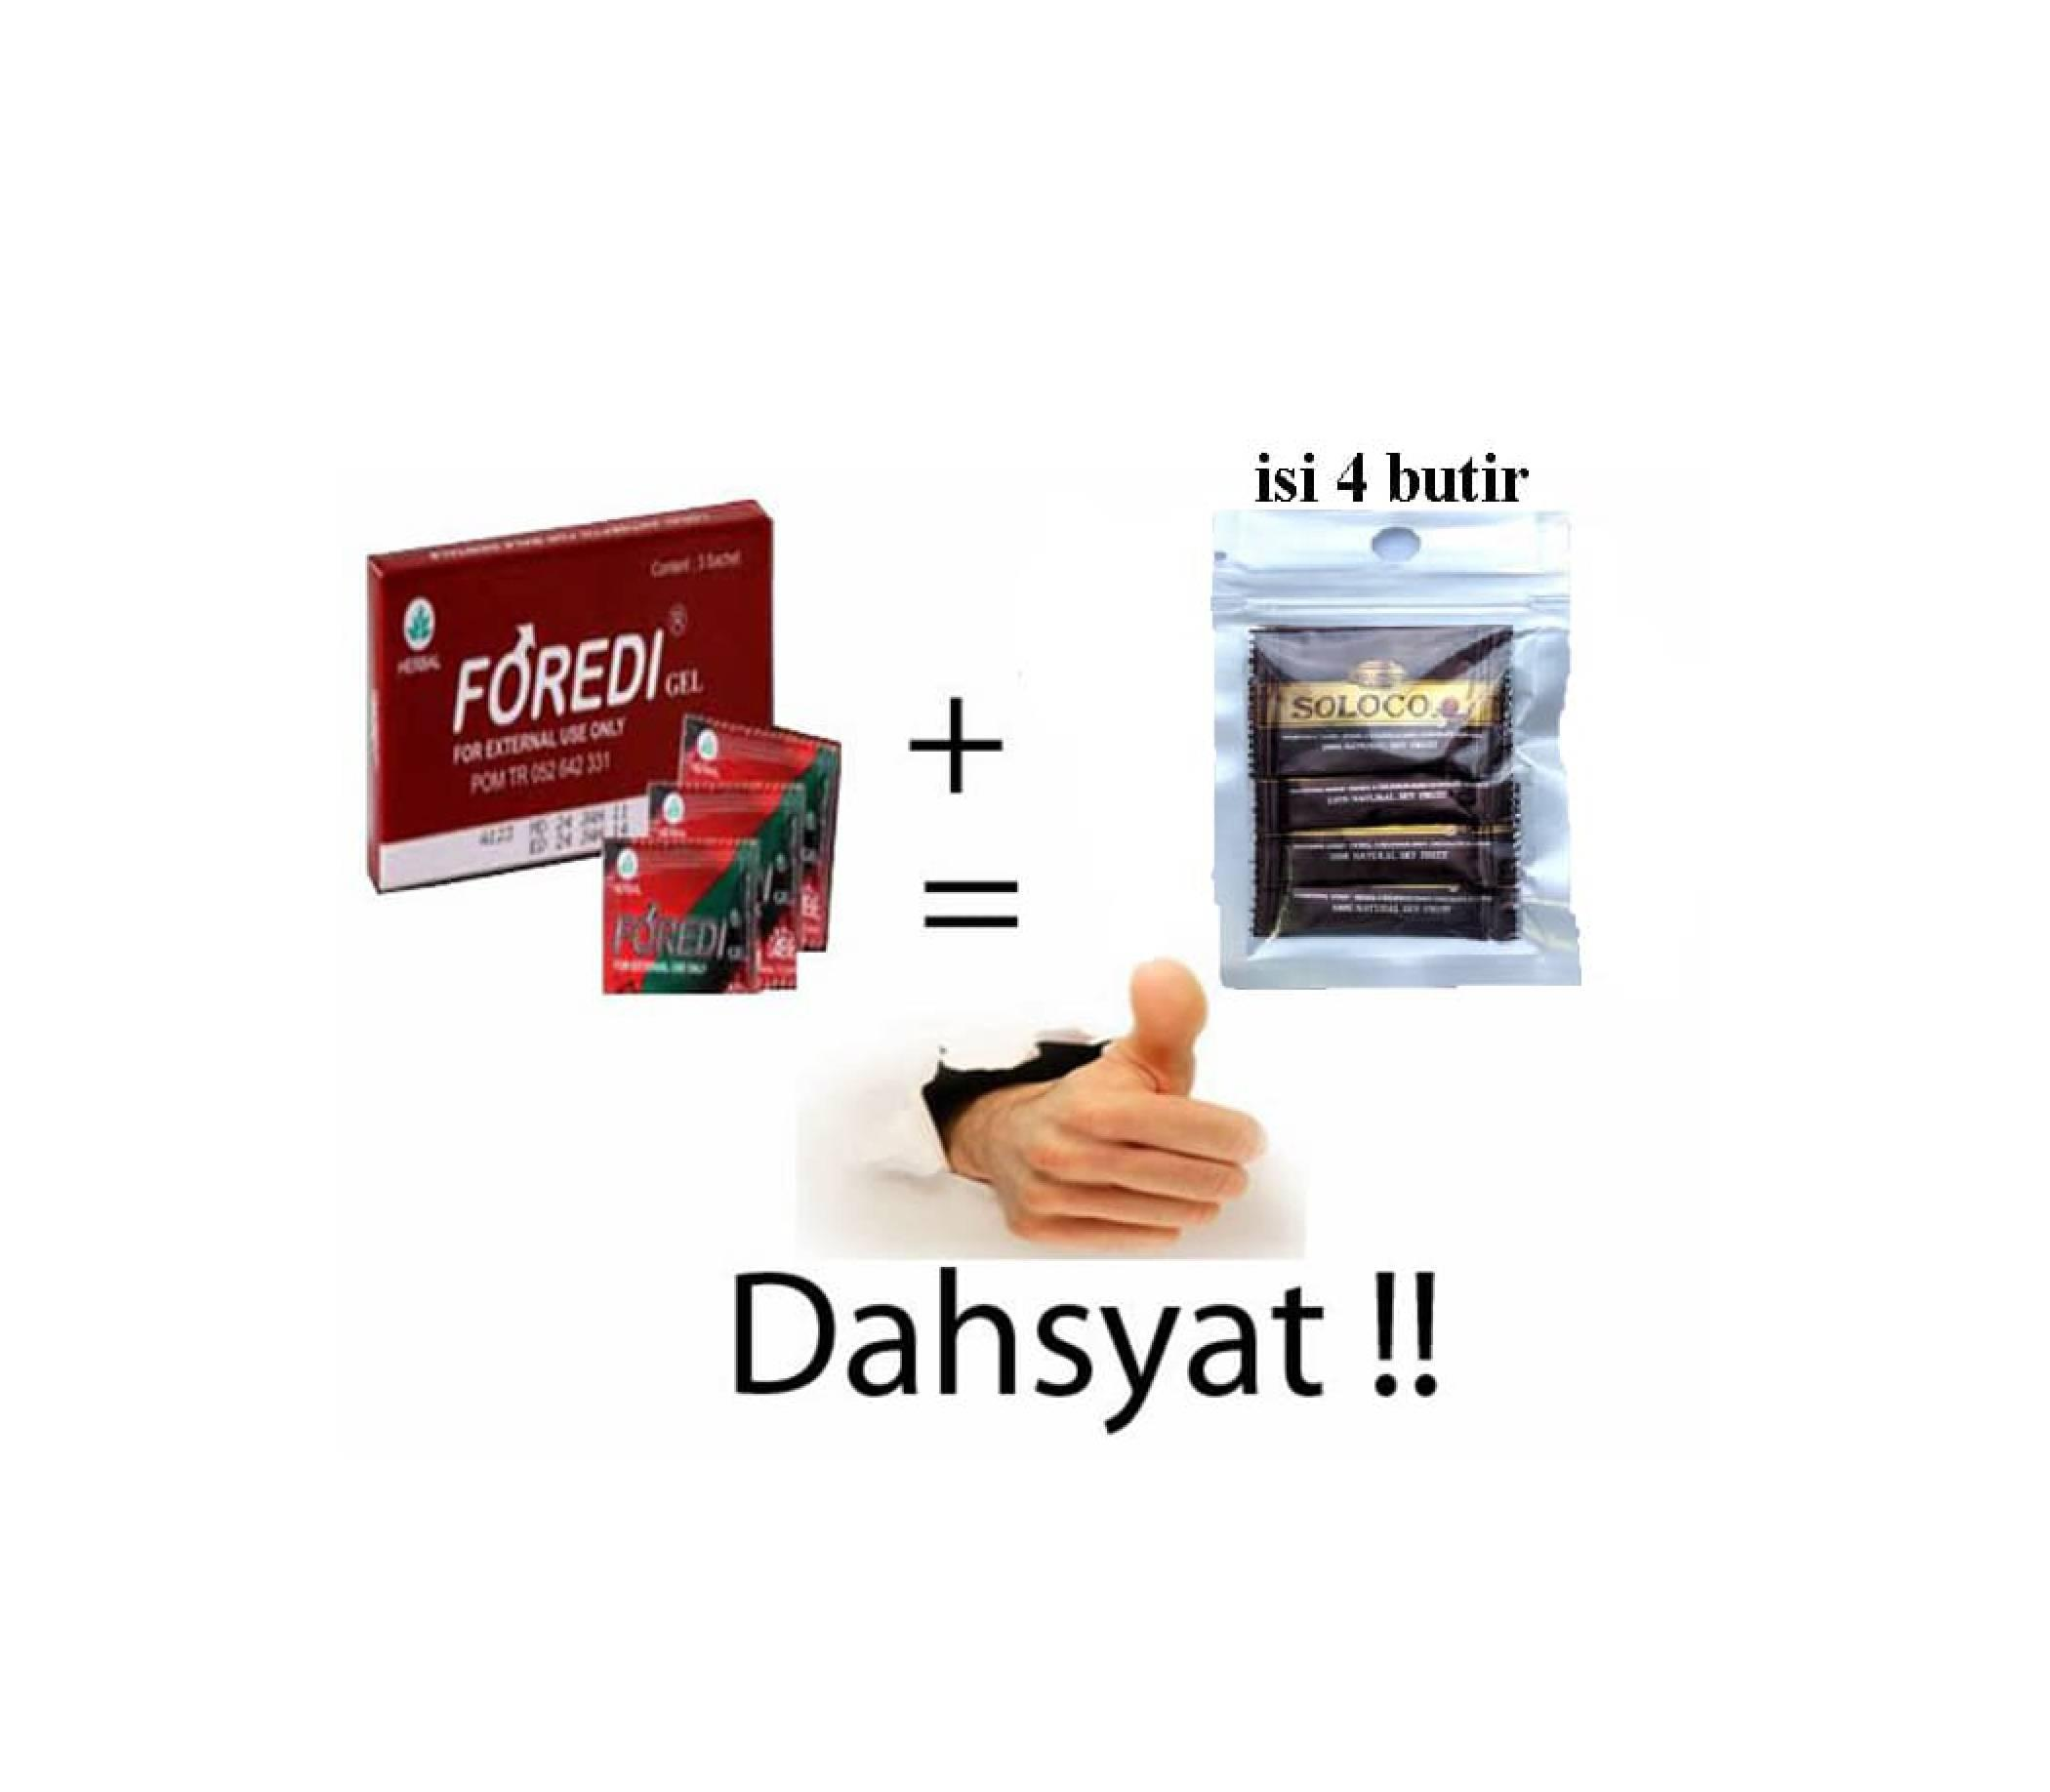 Paket DAHSYAT FOREDI 1 Box isi 3 sachet + SOLOCO 1 Bgks isi 4 butir